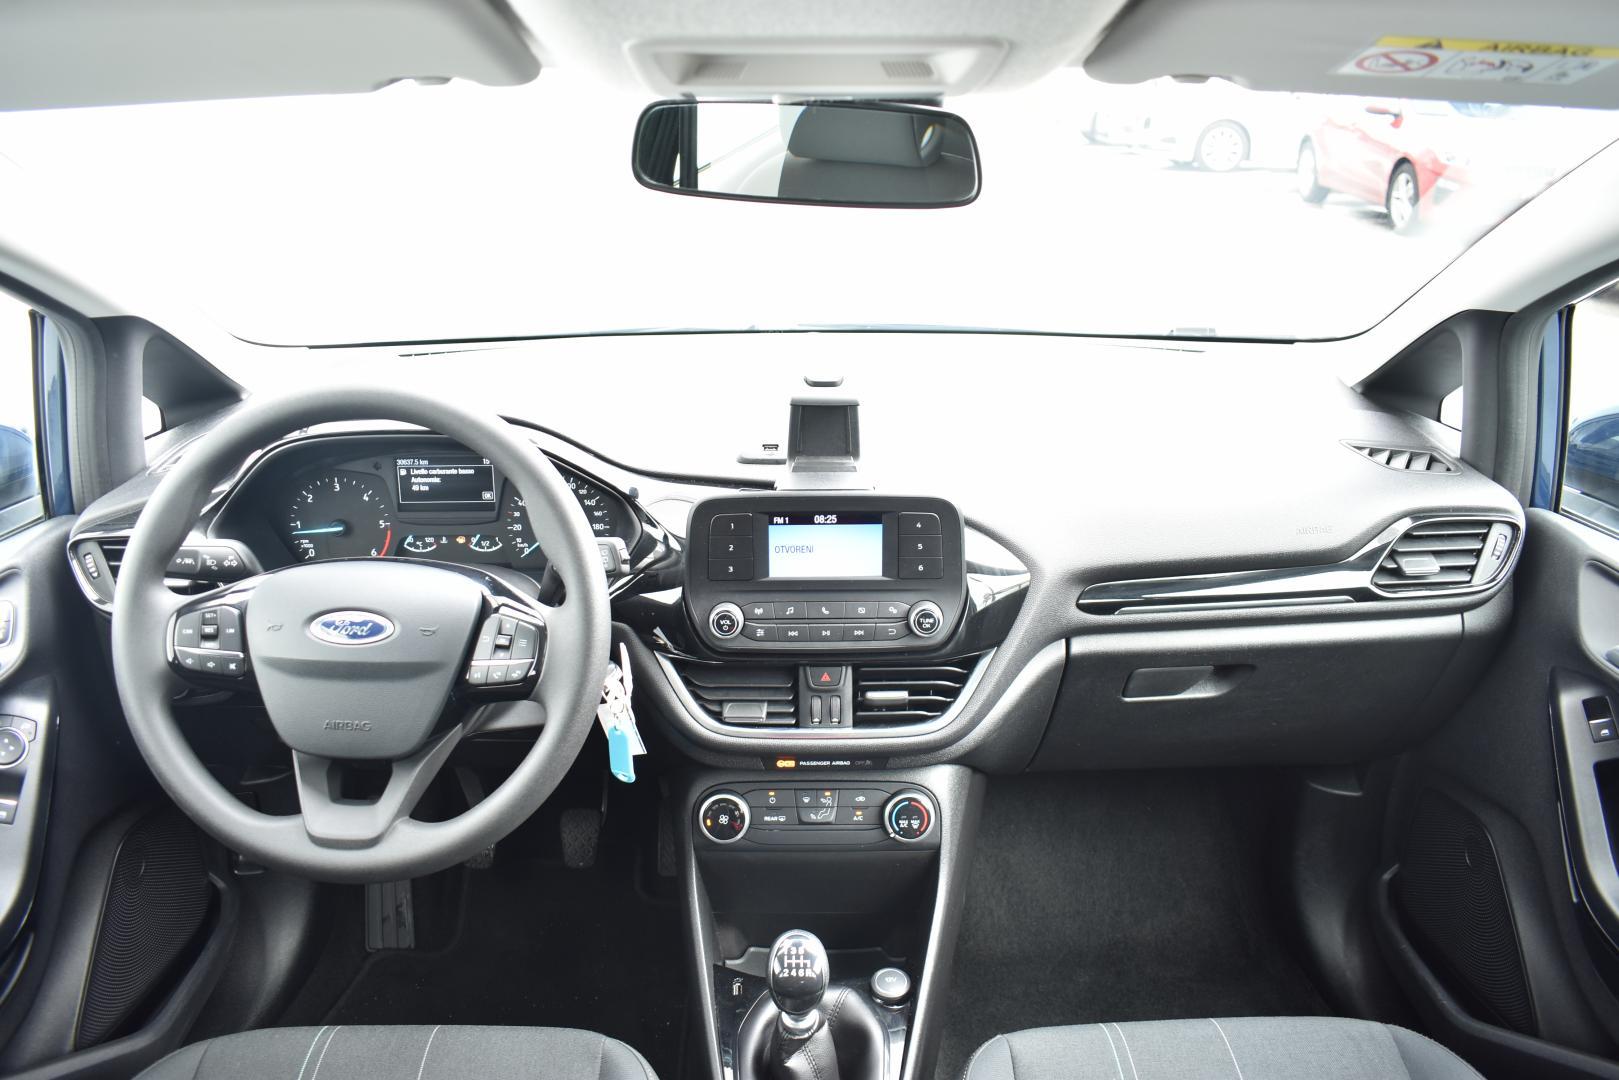 Ford Fiesta 1.5 TDCI, TEMP, BLUETOOTH, 2 GODINE GARANCIJE